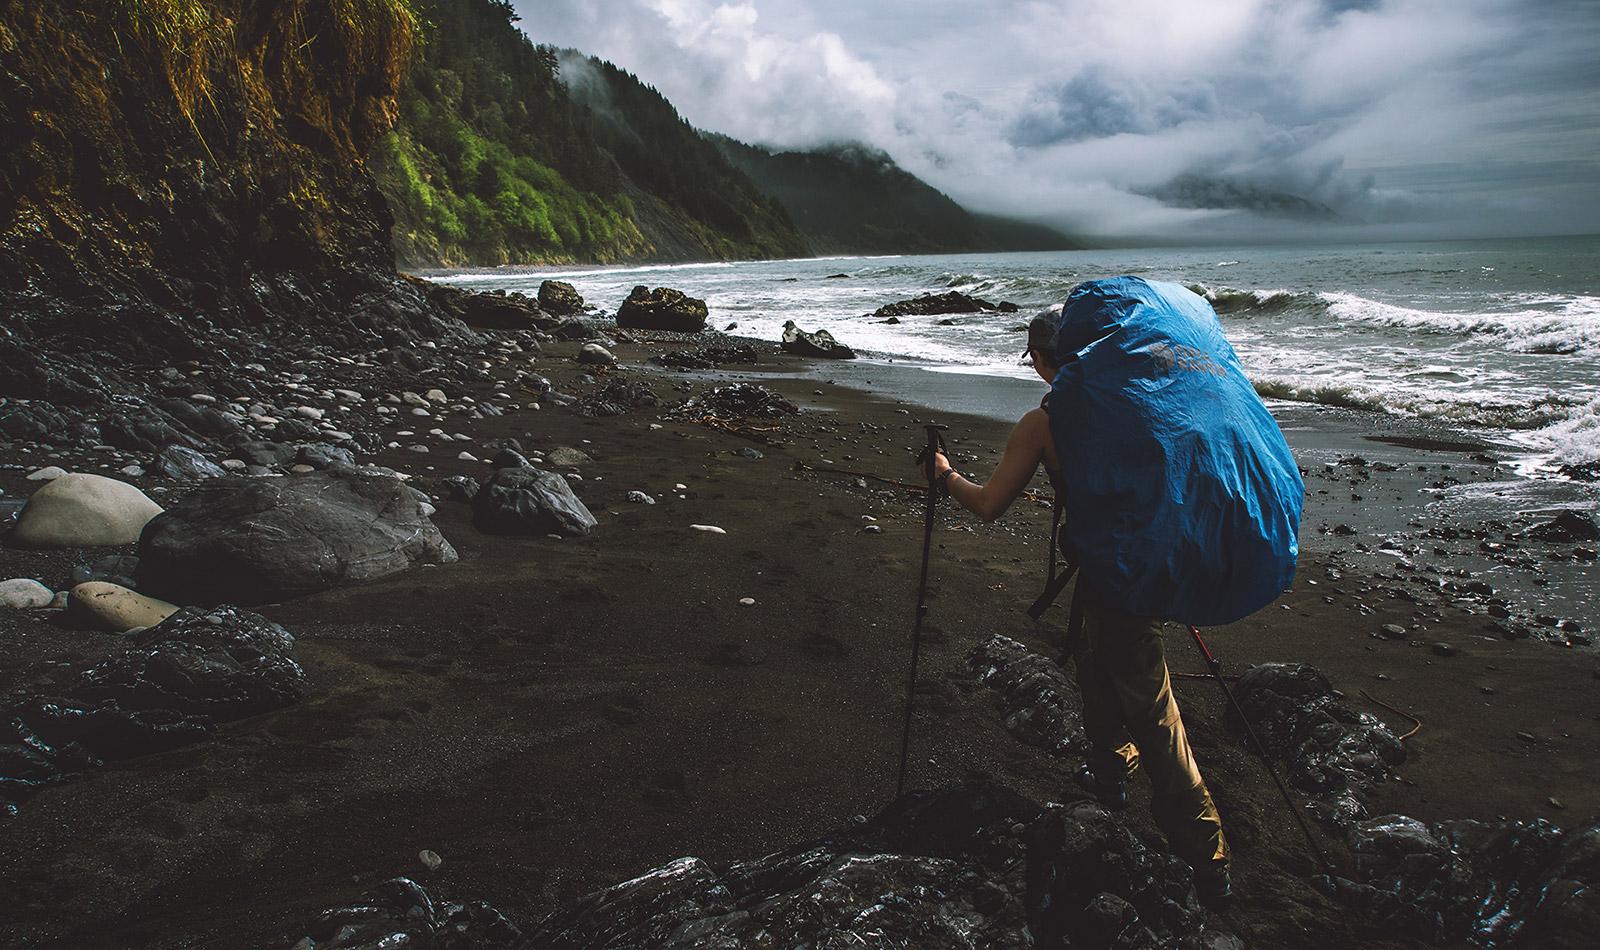 Lost Coast Trail – Jay Kolsch